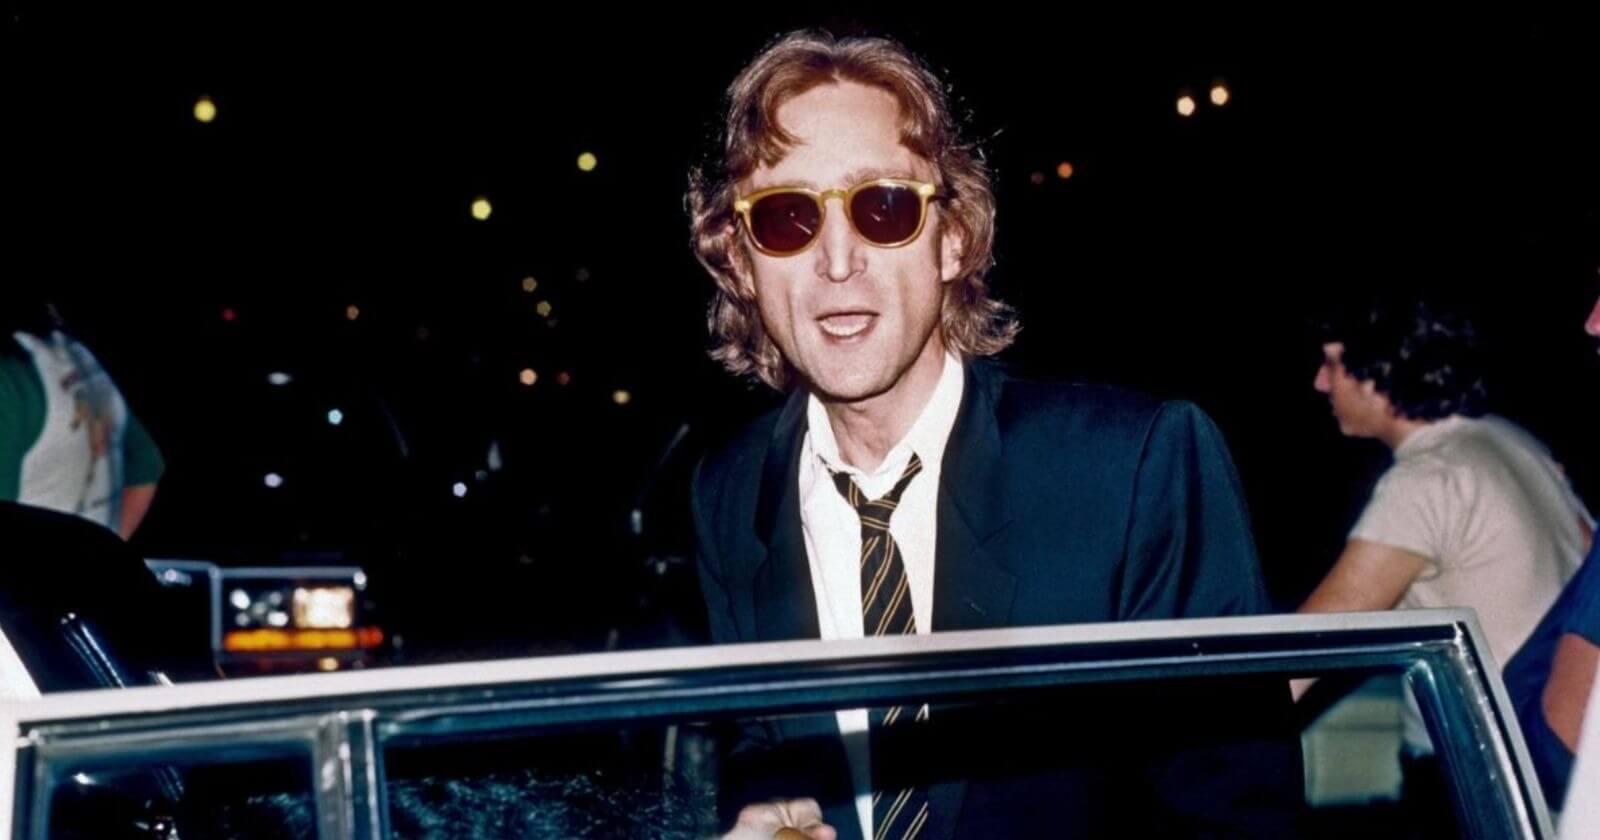 John Lennon car